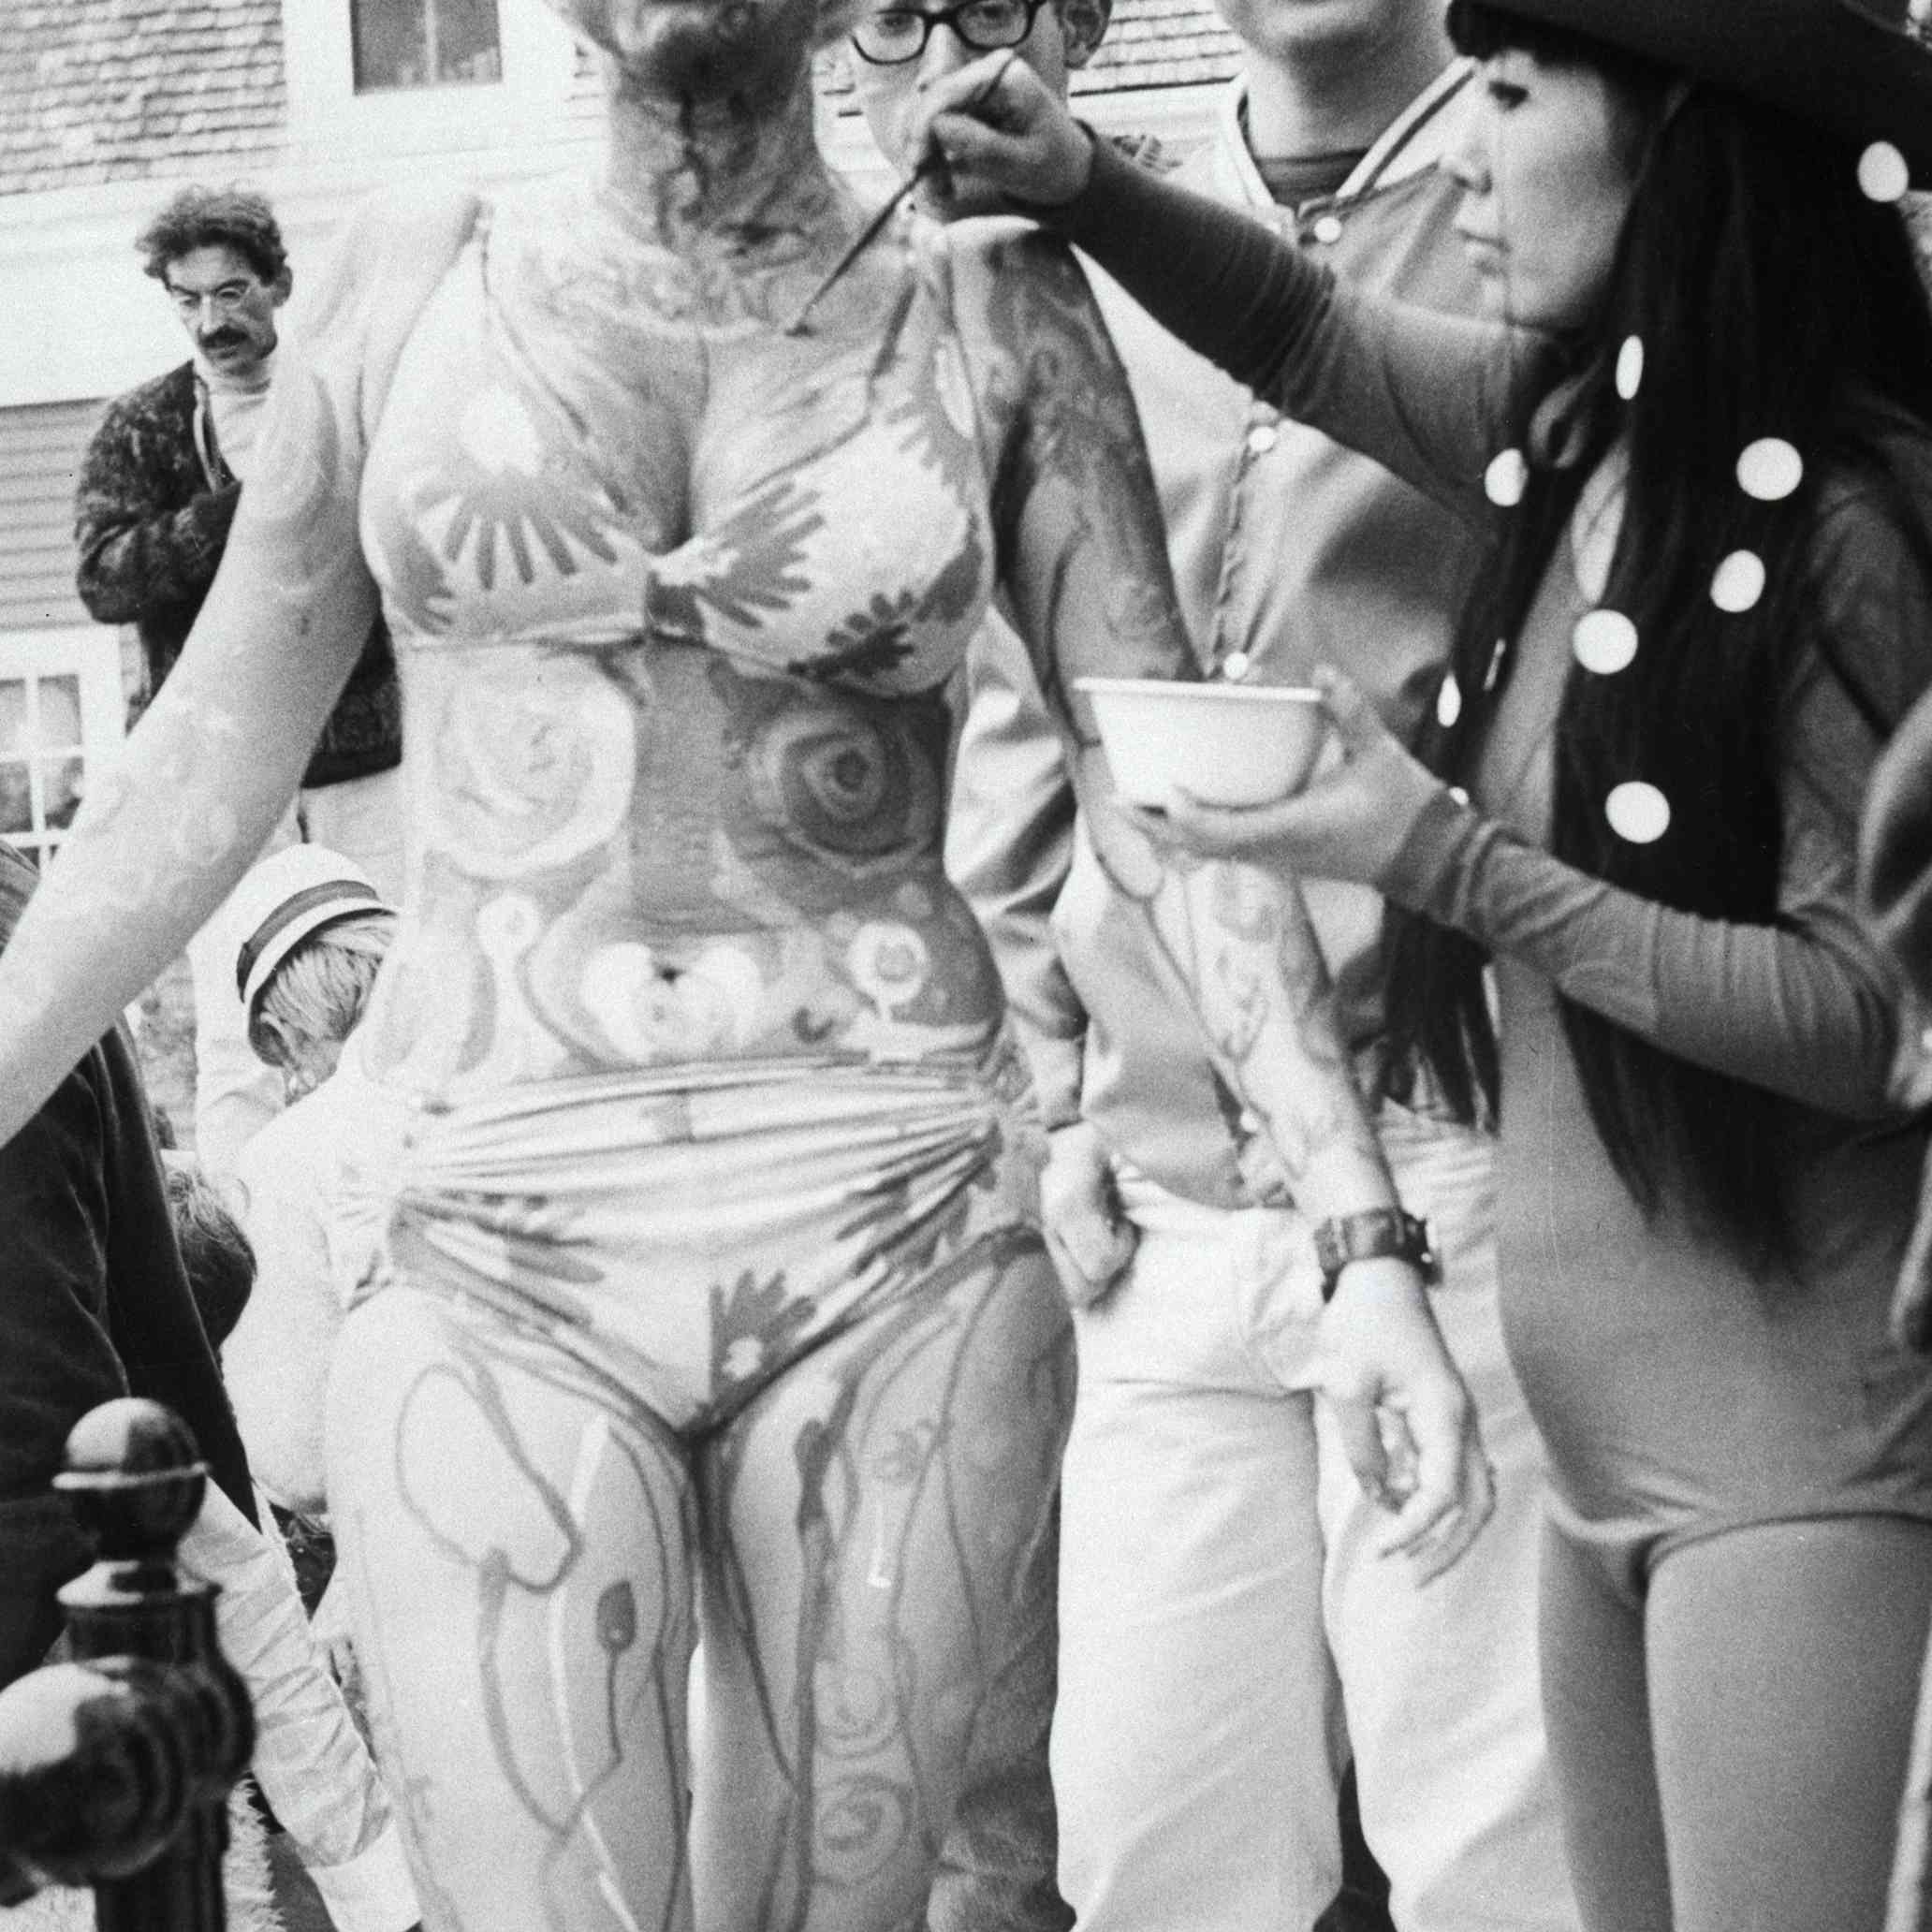 Hippie Having Body Painted